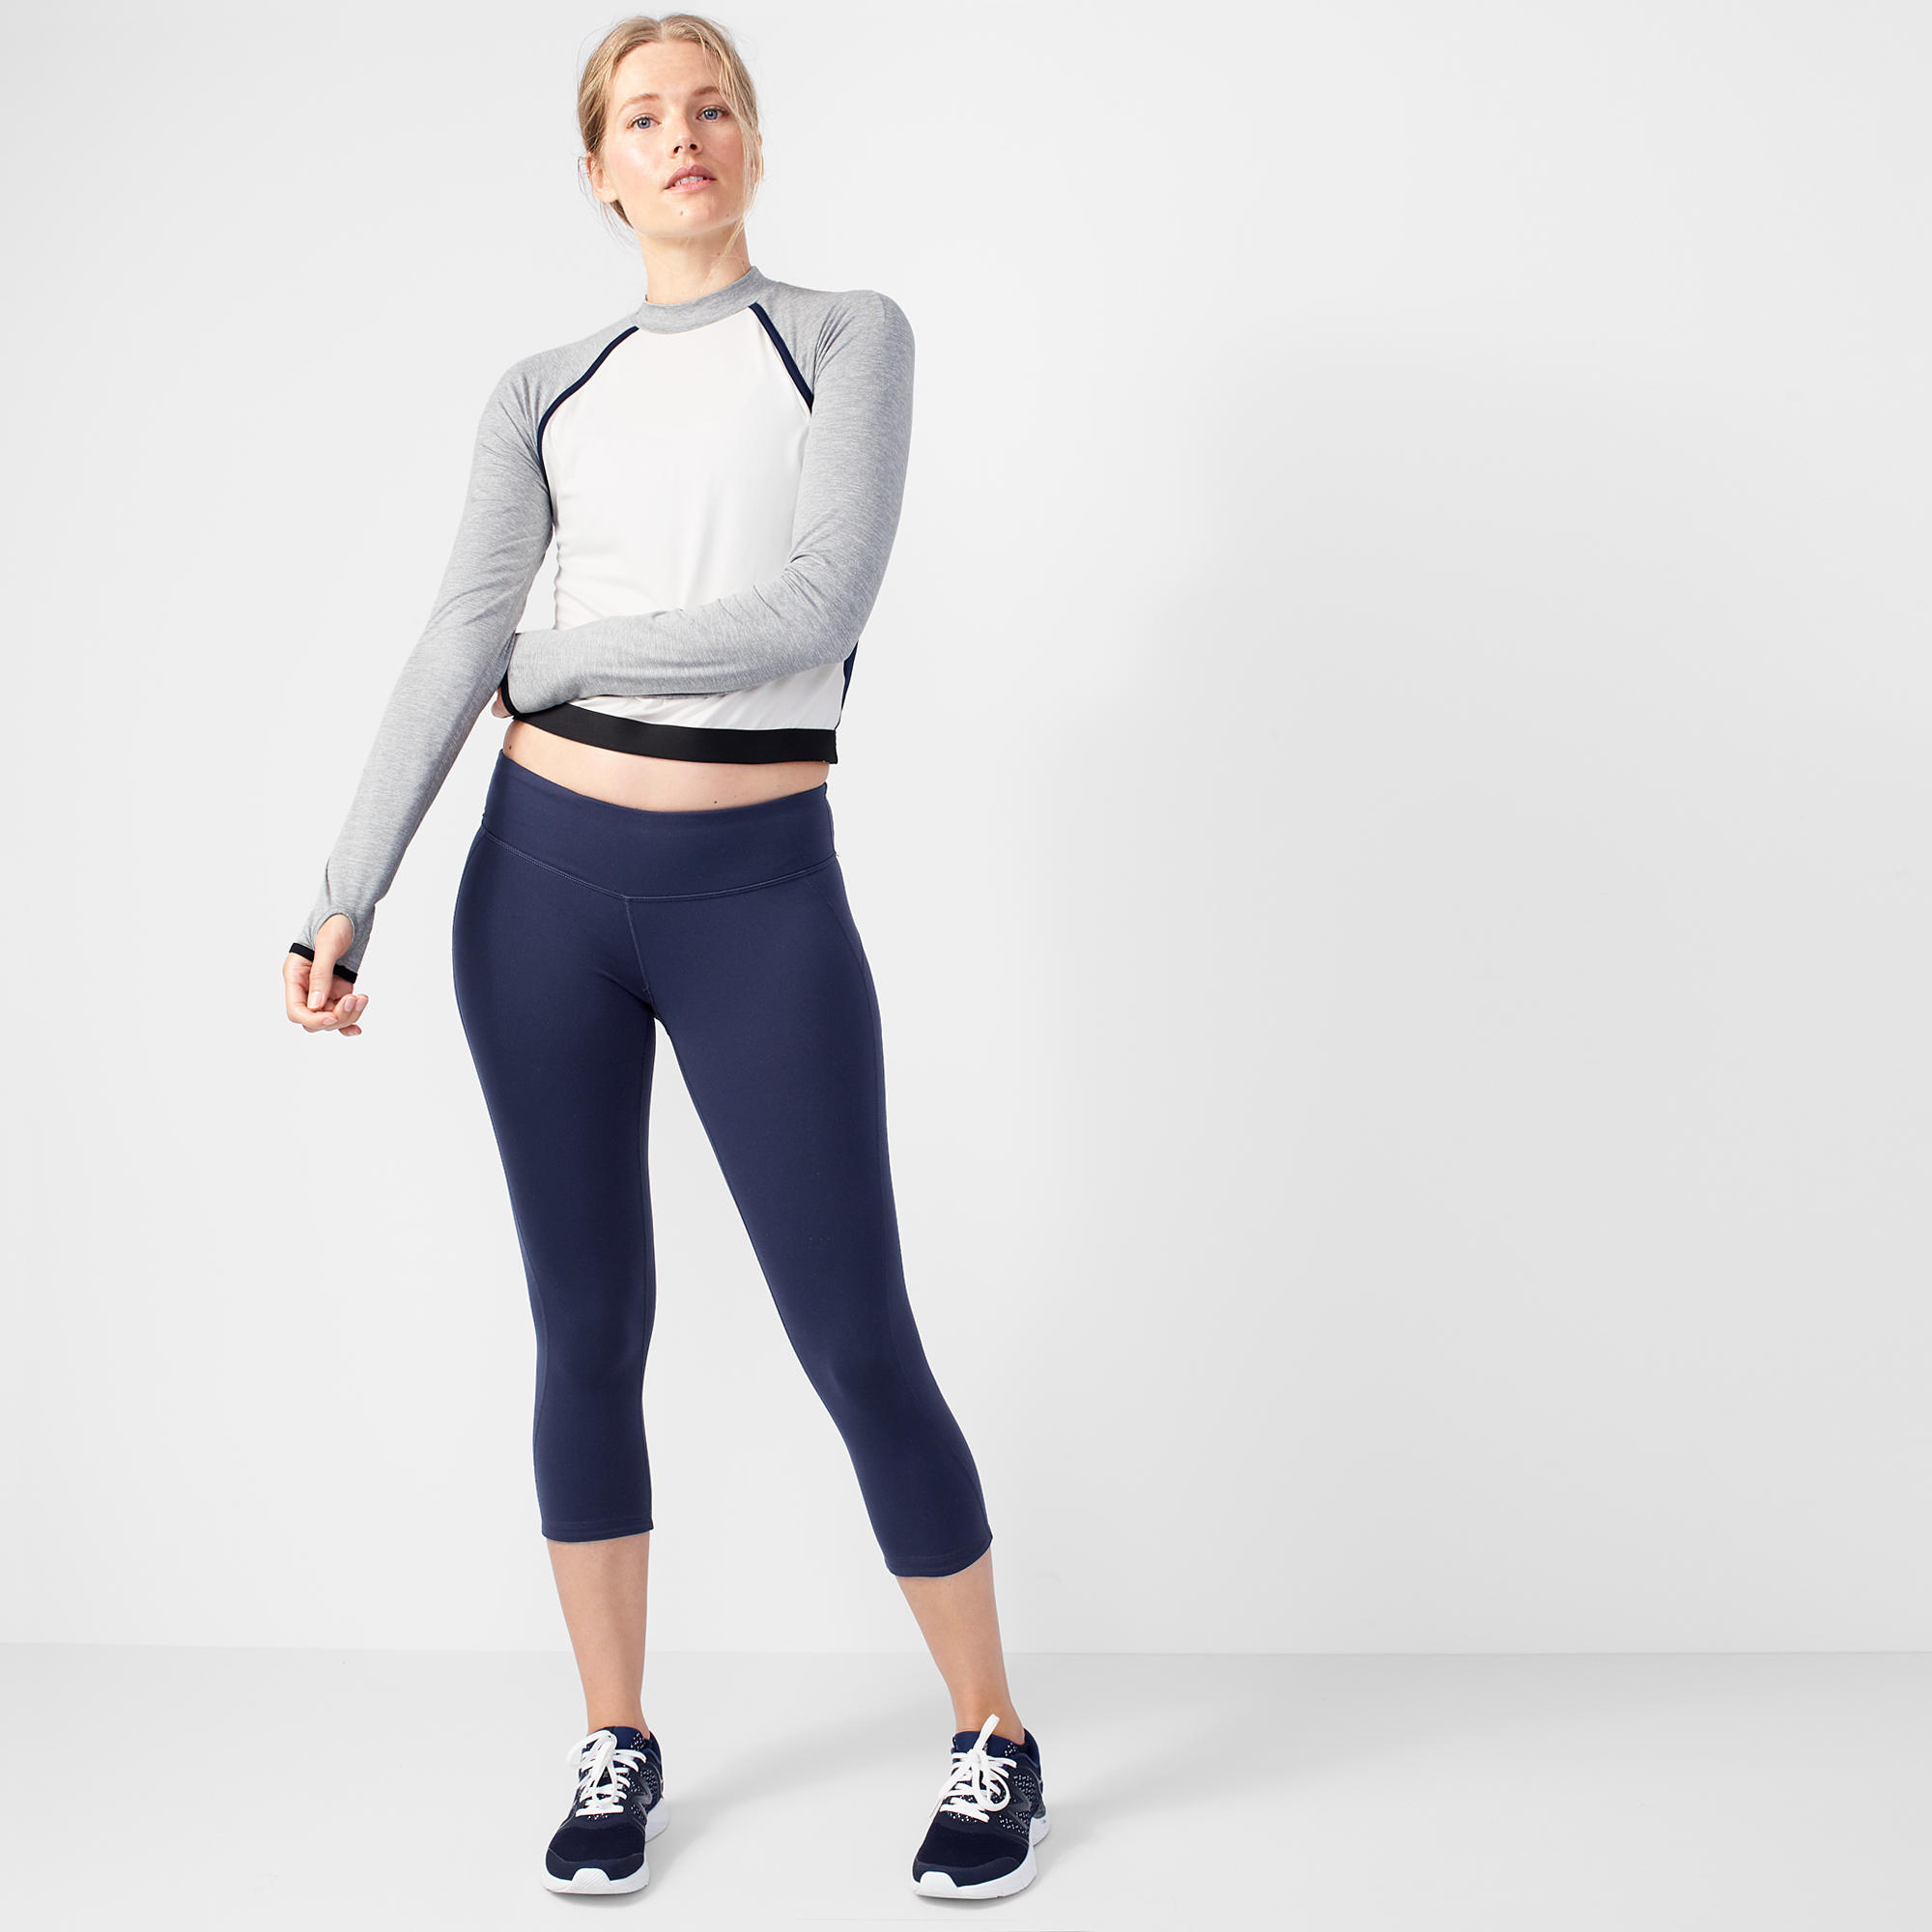 new balance 1500 beige leggings